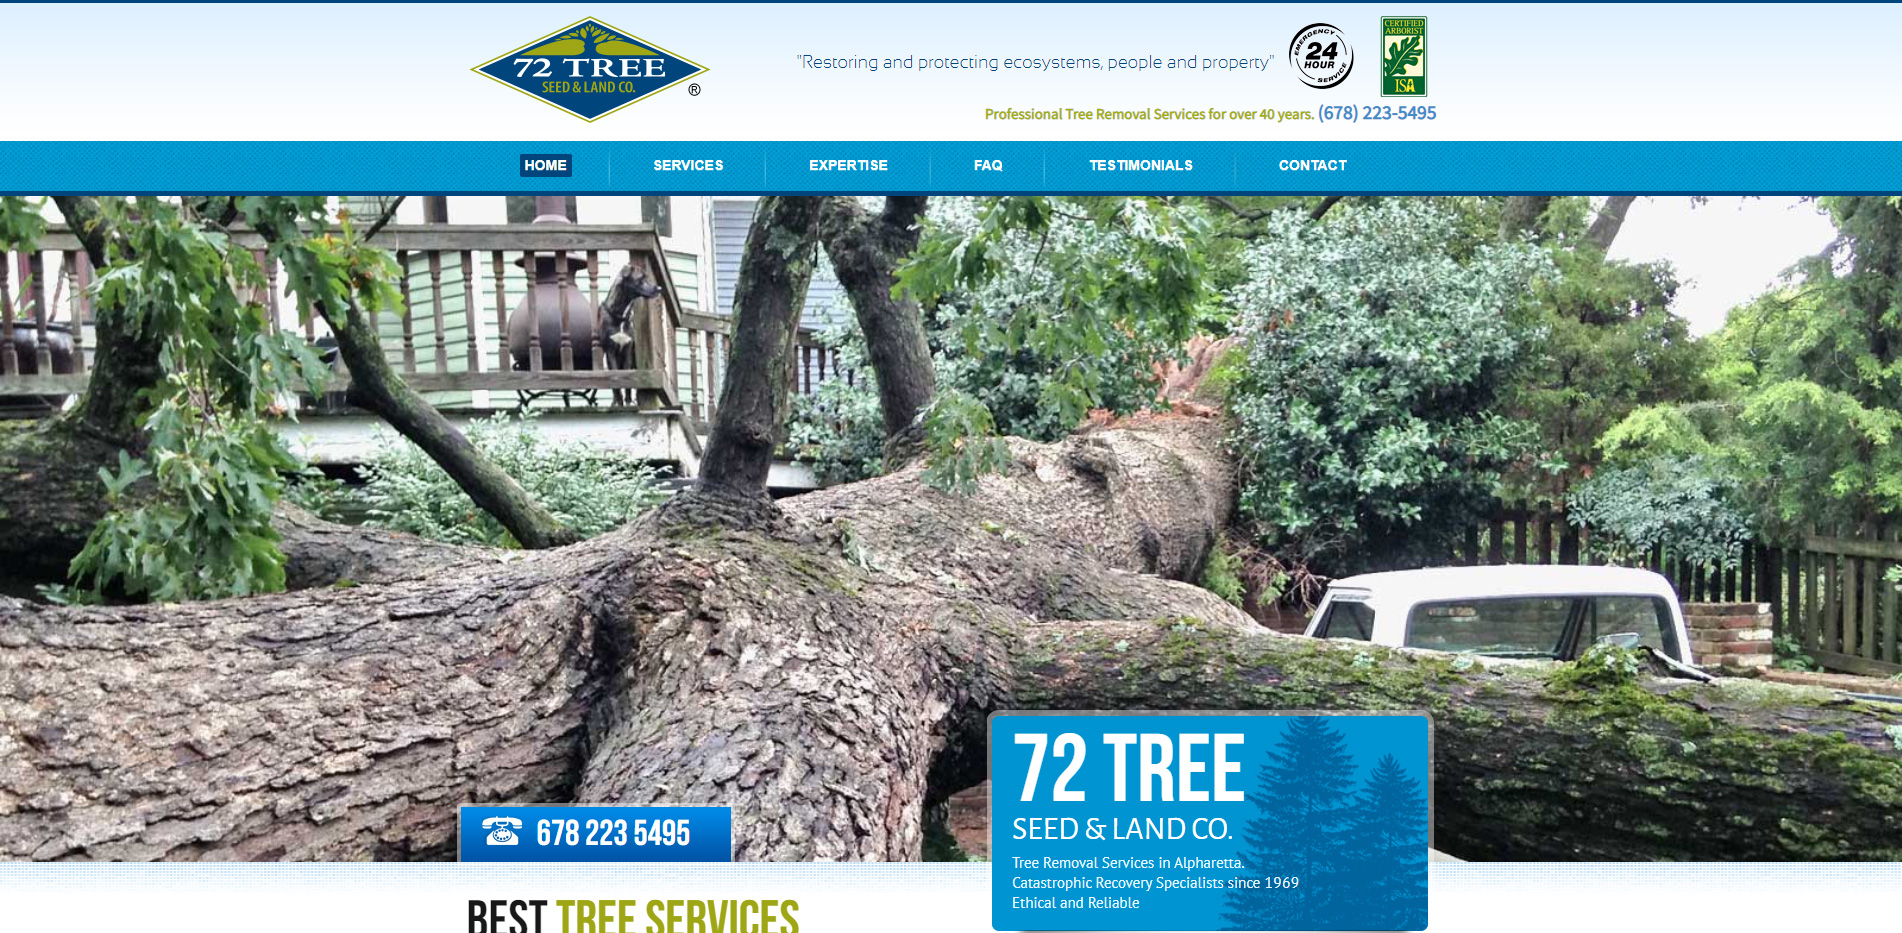 atlanta | website | company | development | web design company | web designers